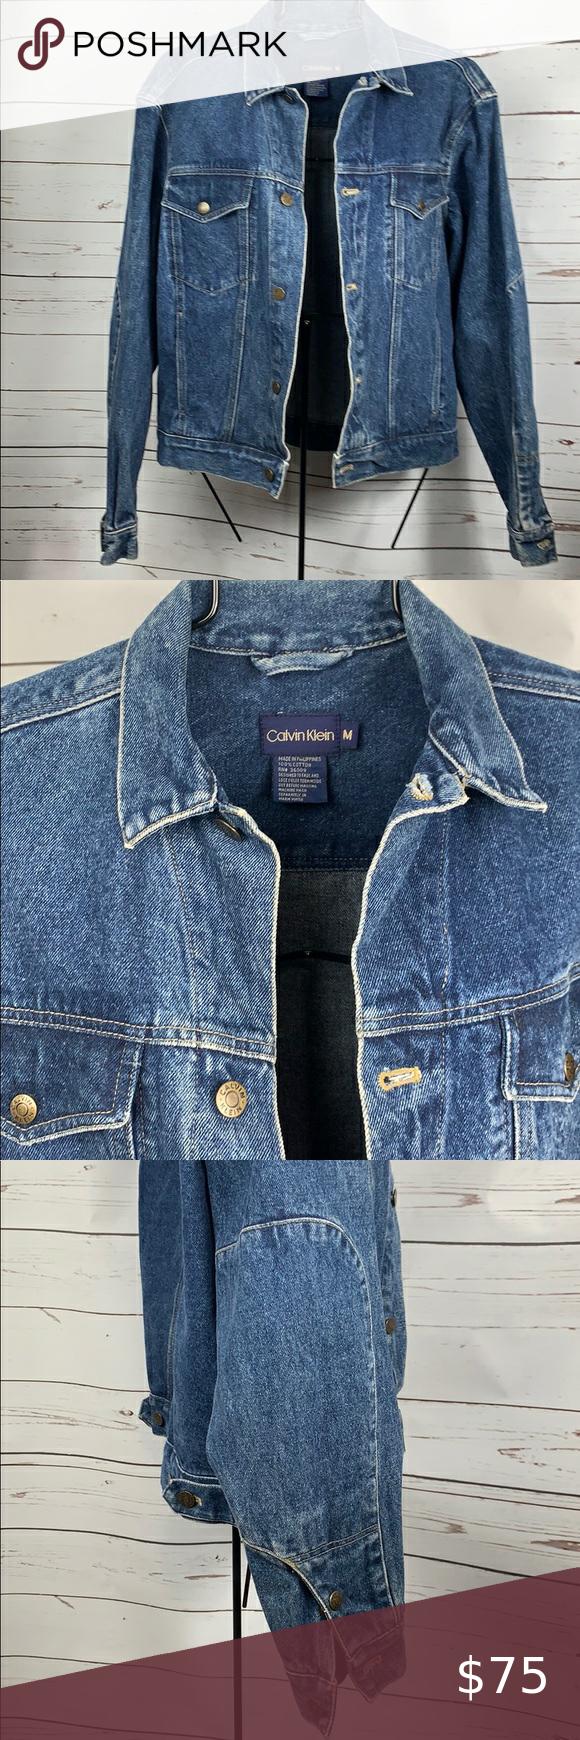 Calvin Klein Vintage Denim Jean Jacket Medium Vtg In 2020 Vintage Denim Jeans Vintage Denim Vintage Denim Jacket